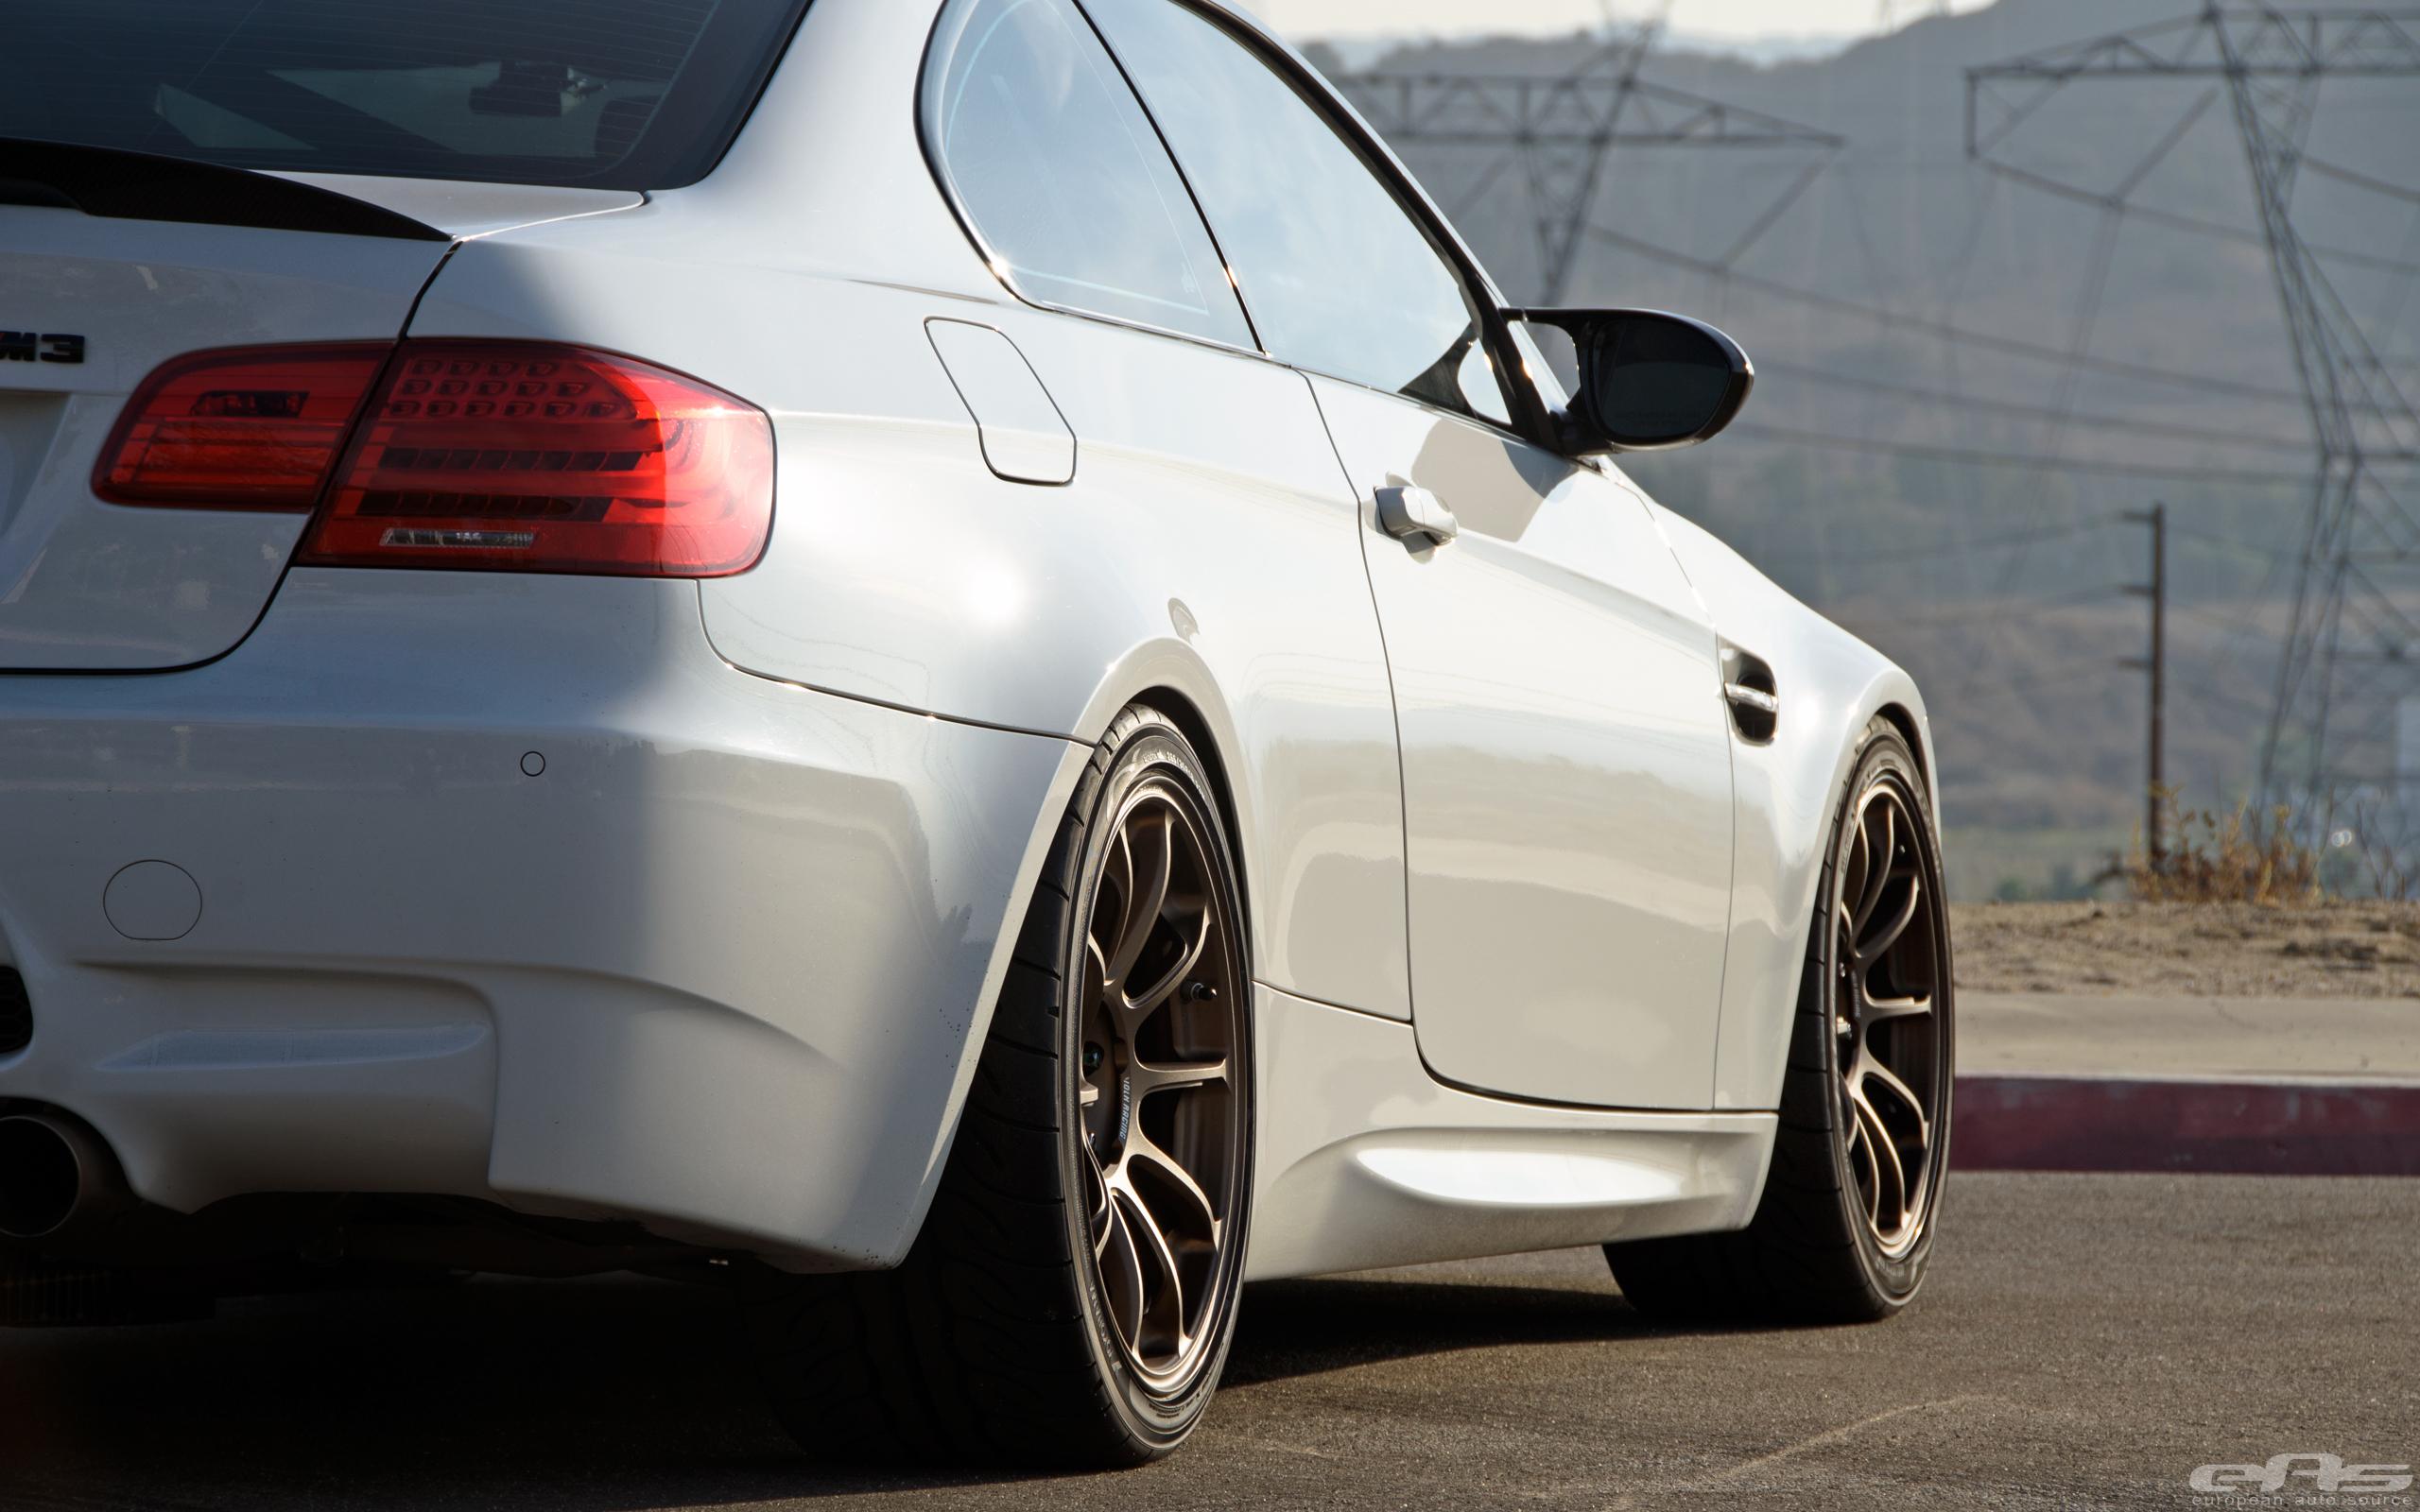 European Auto Source Bmw Mercedes Benz Performance